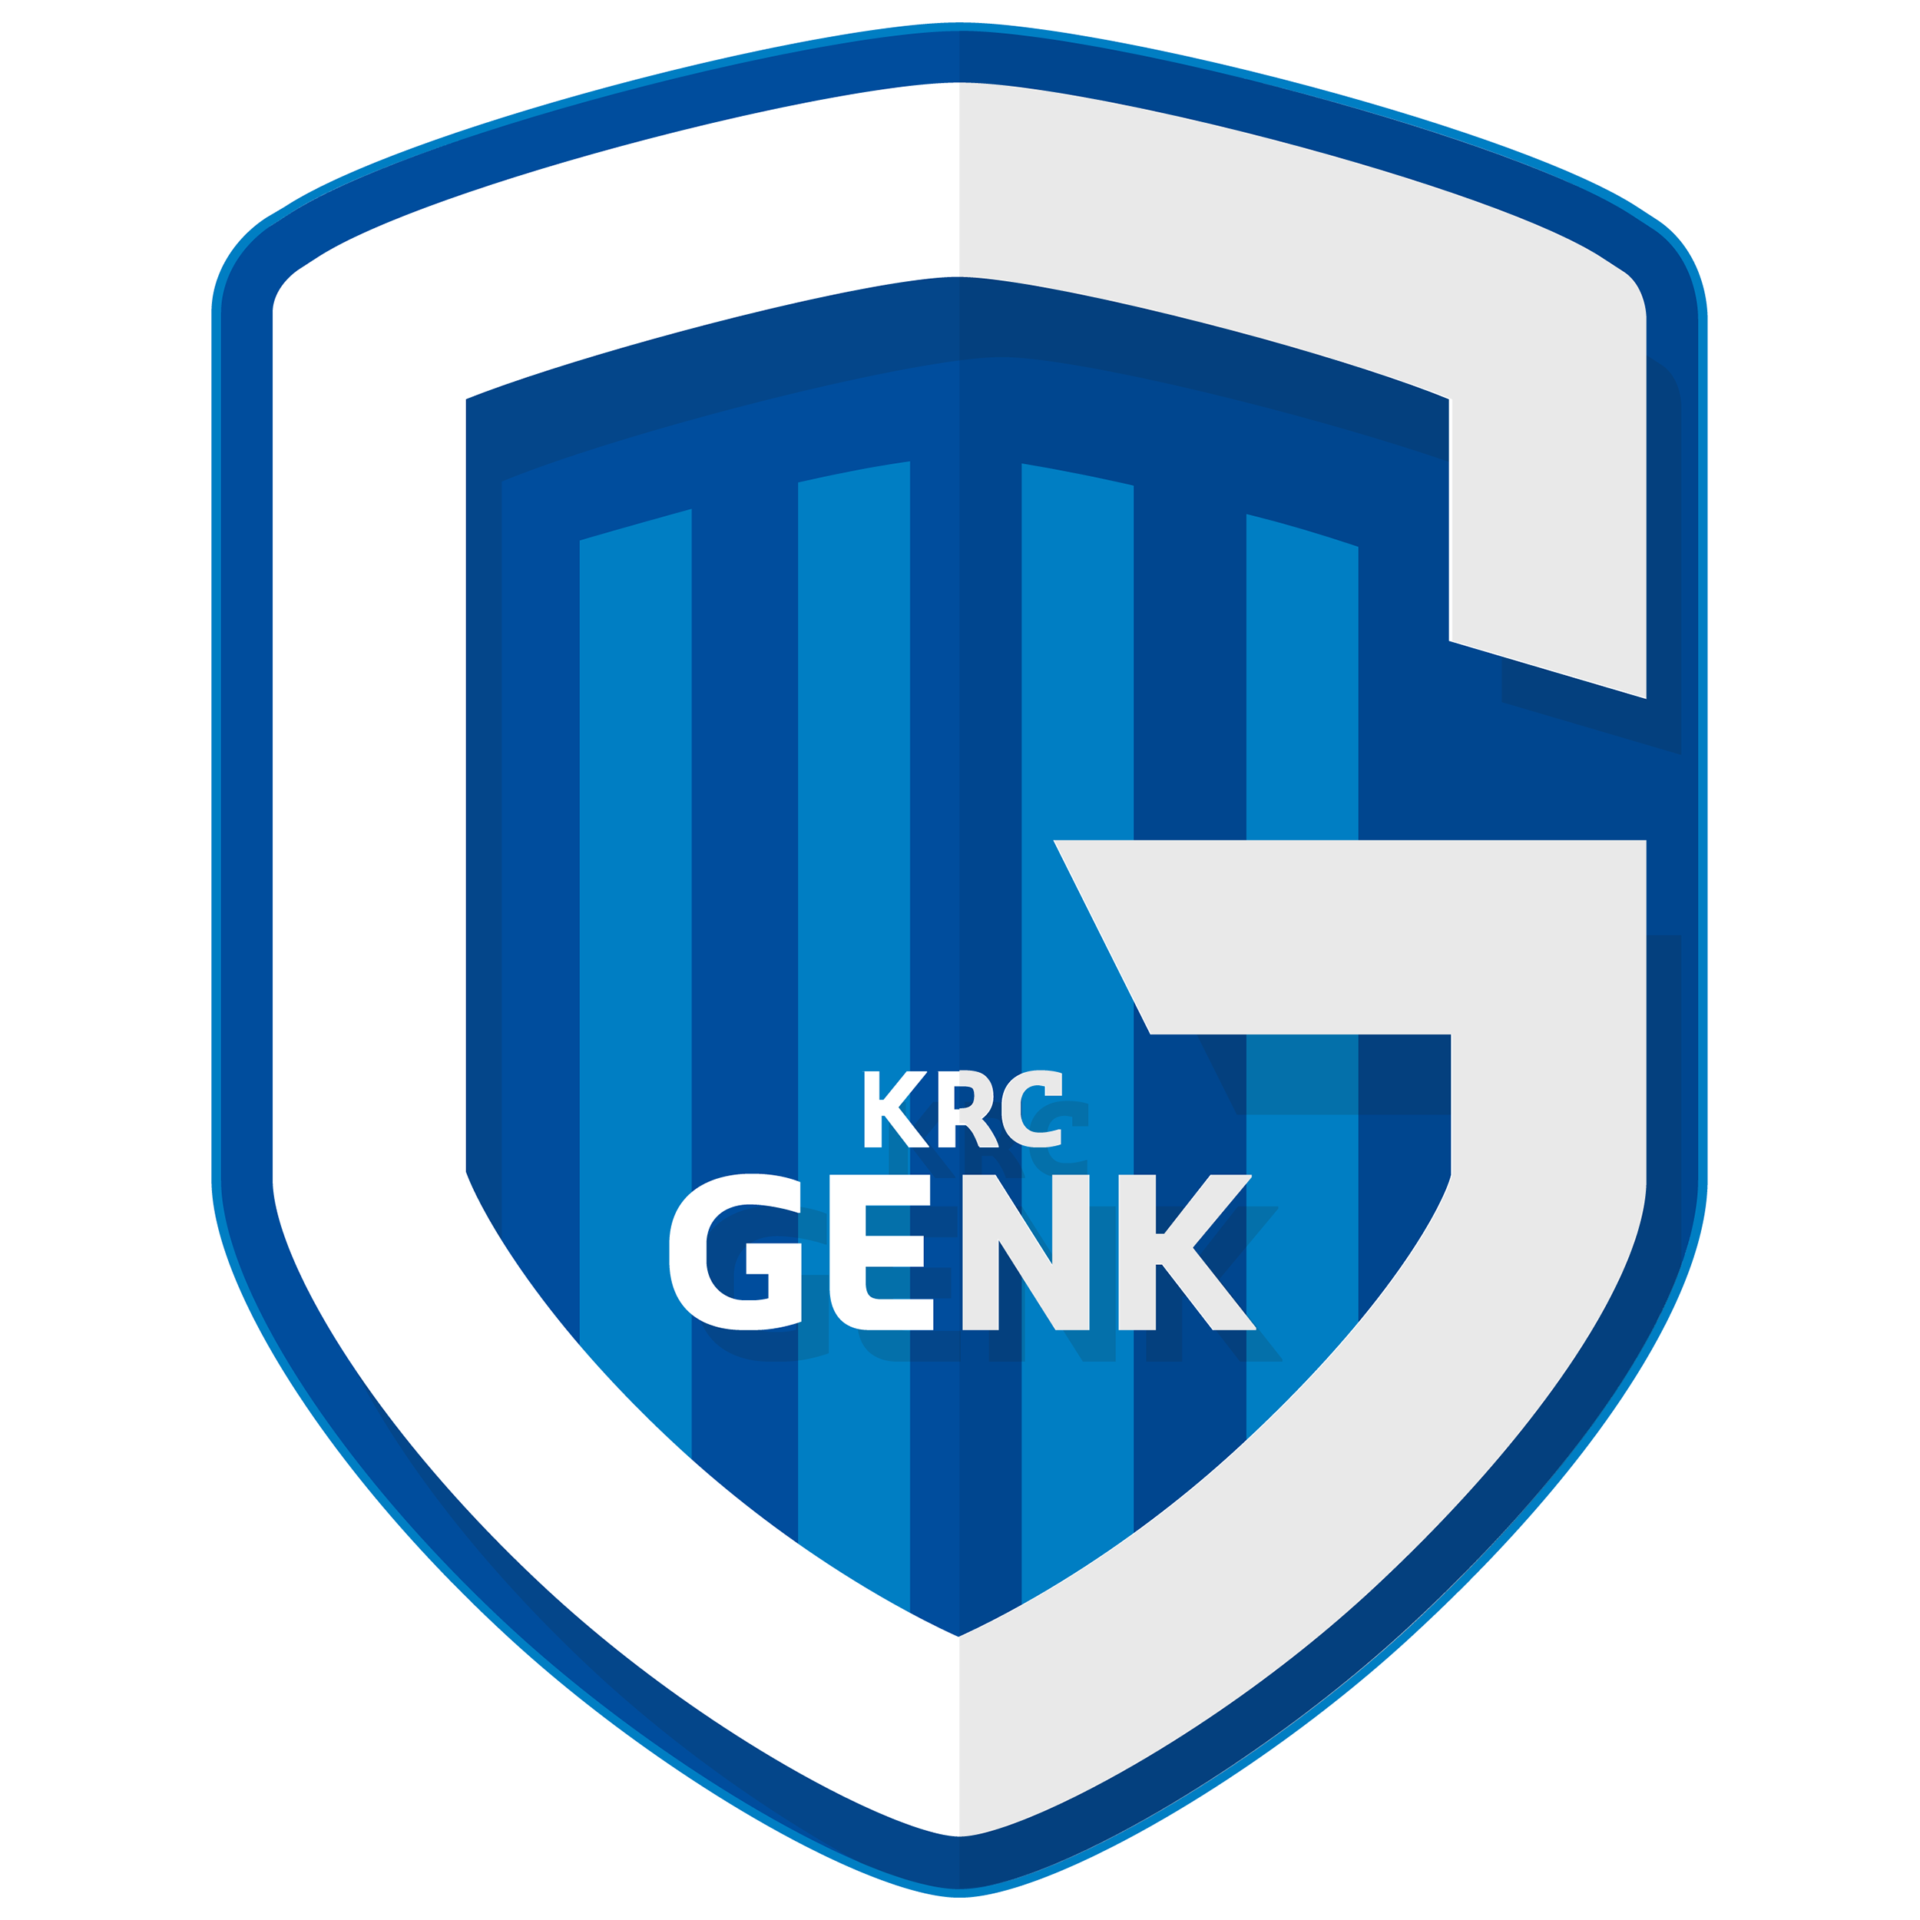 Logo Krc Genk